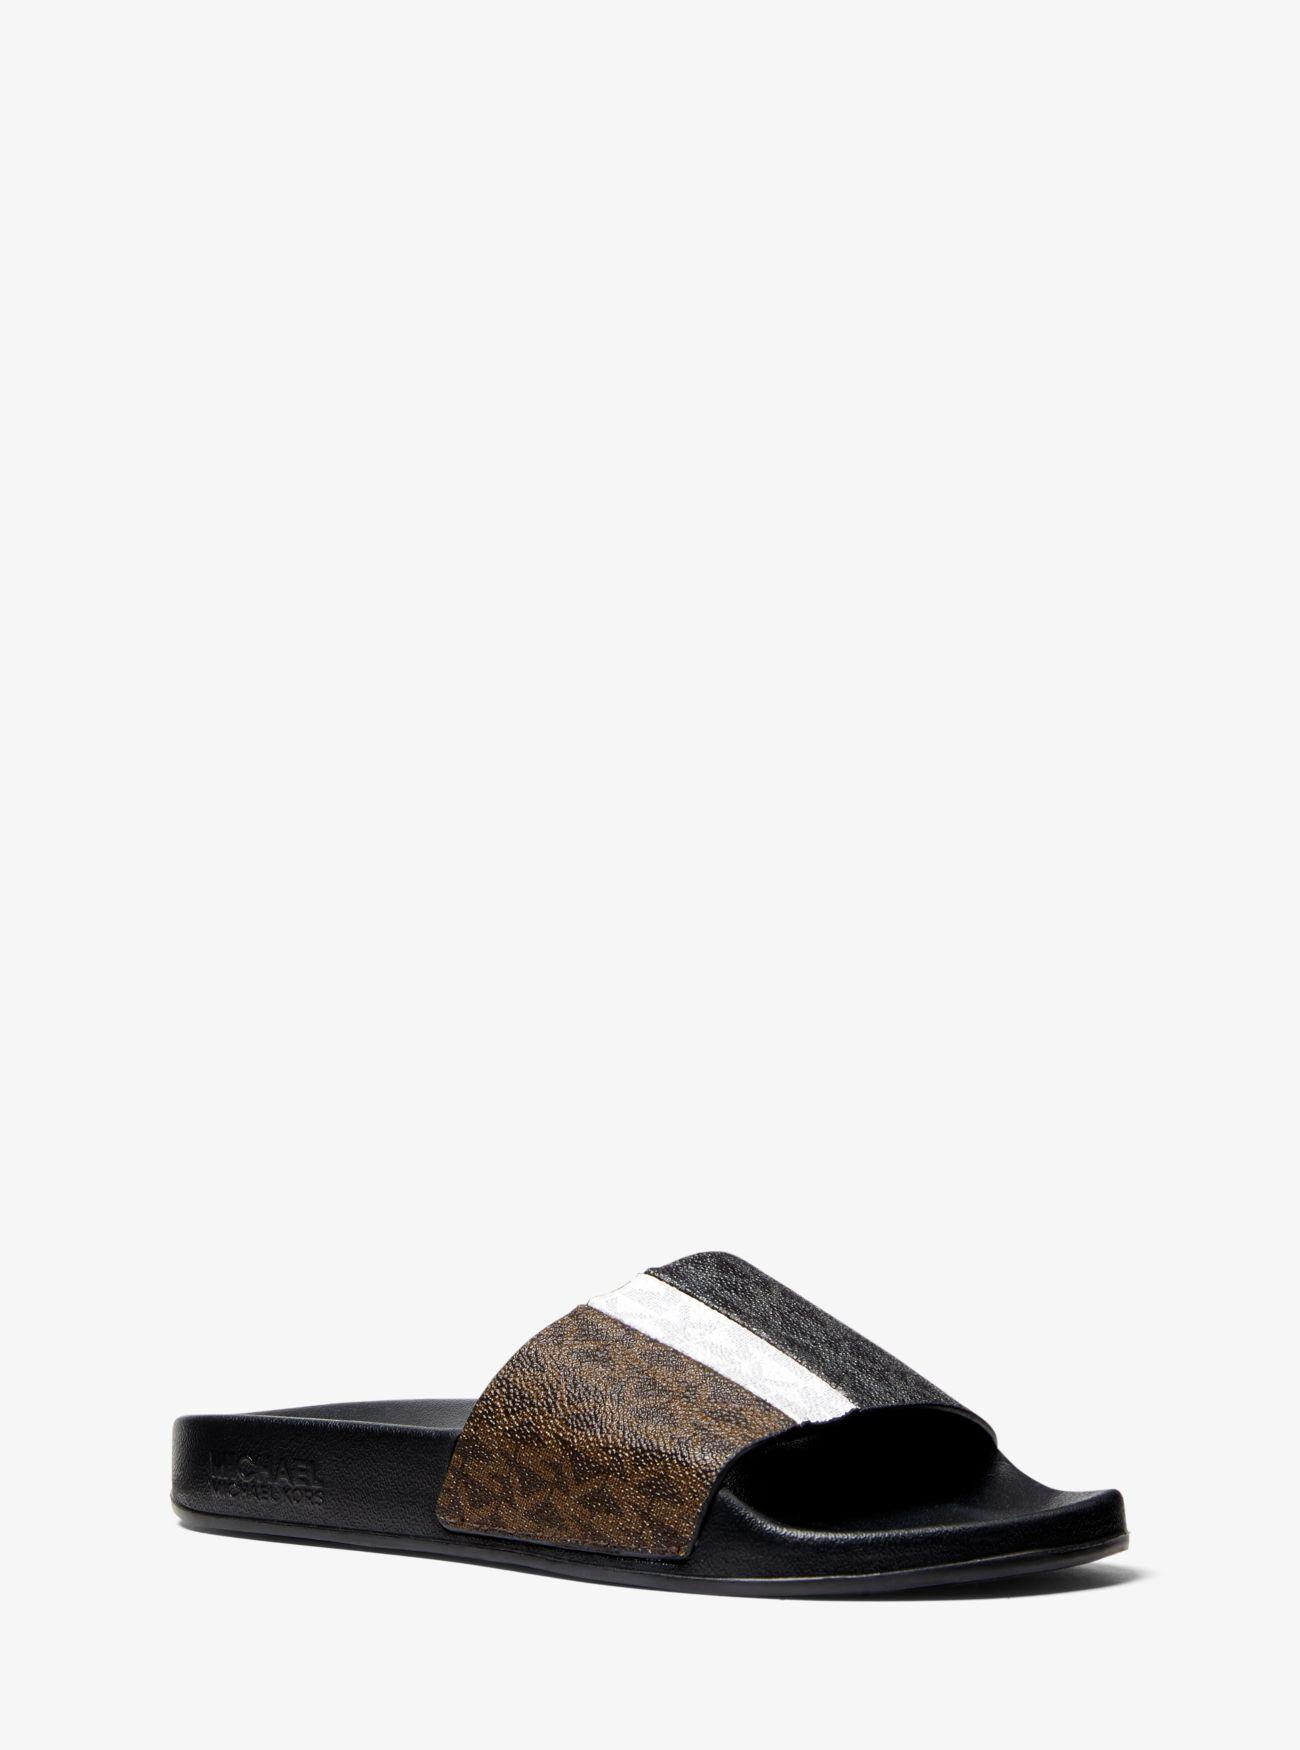 6c0fddb87 Lyst - Michael Kors Ayla Color-block Logo Slide Sandal - Save 25%